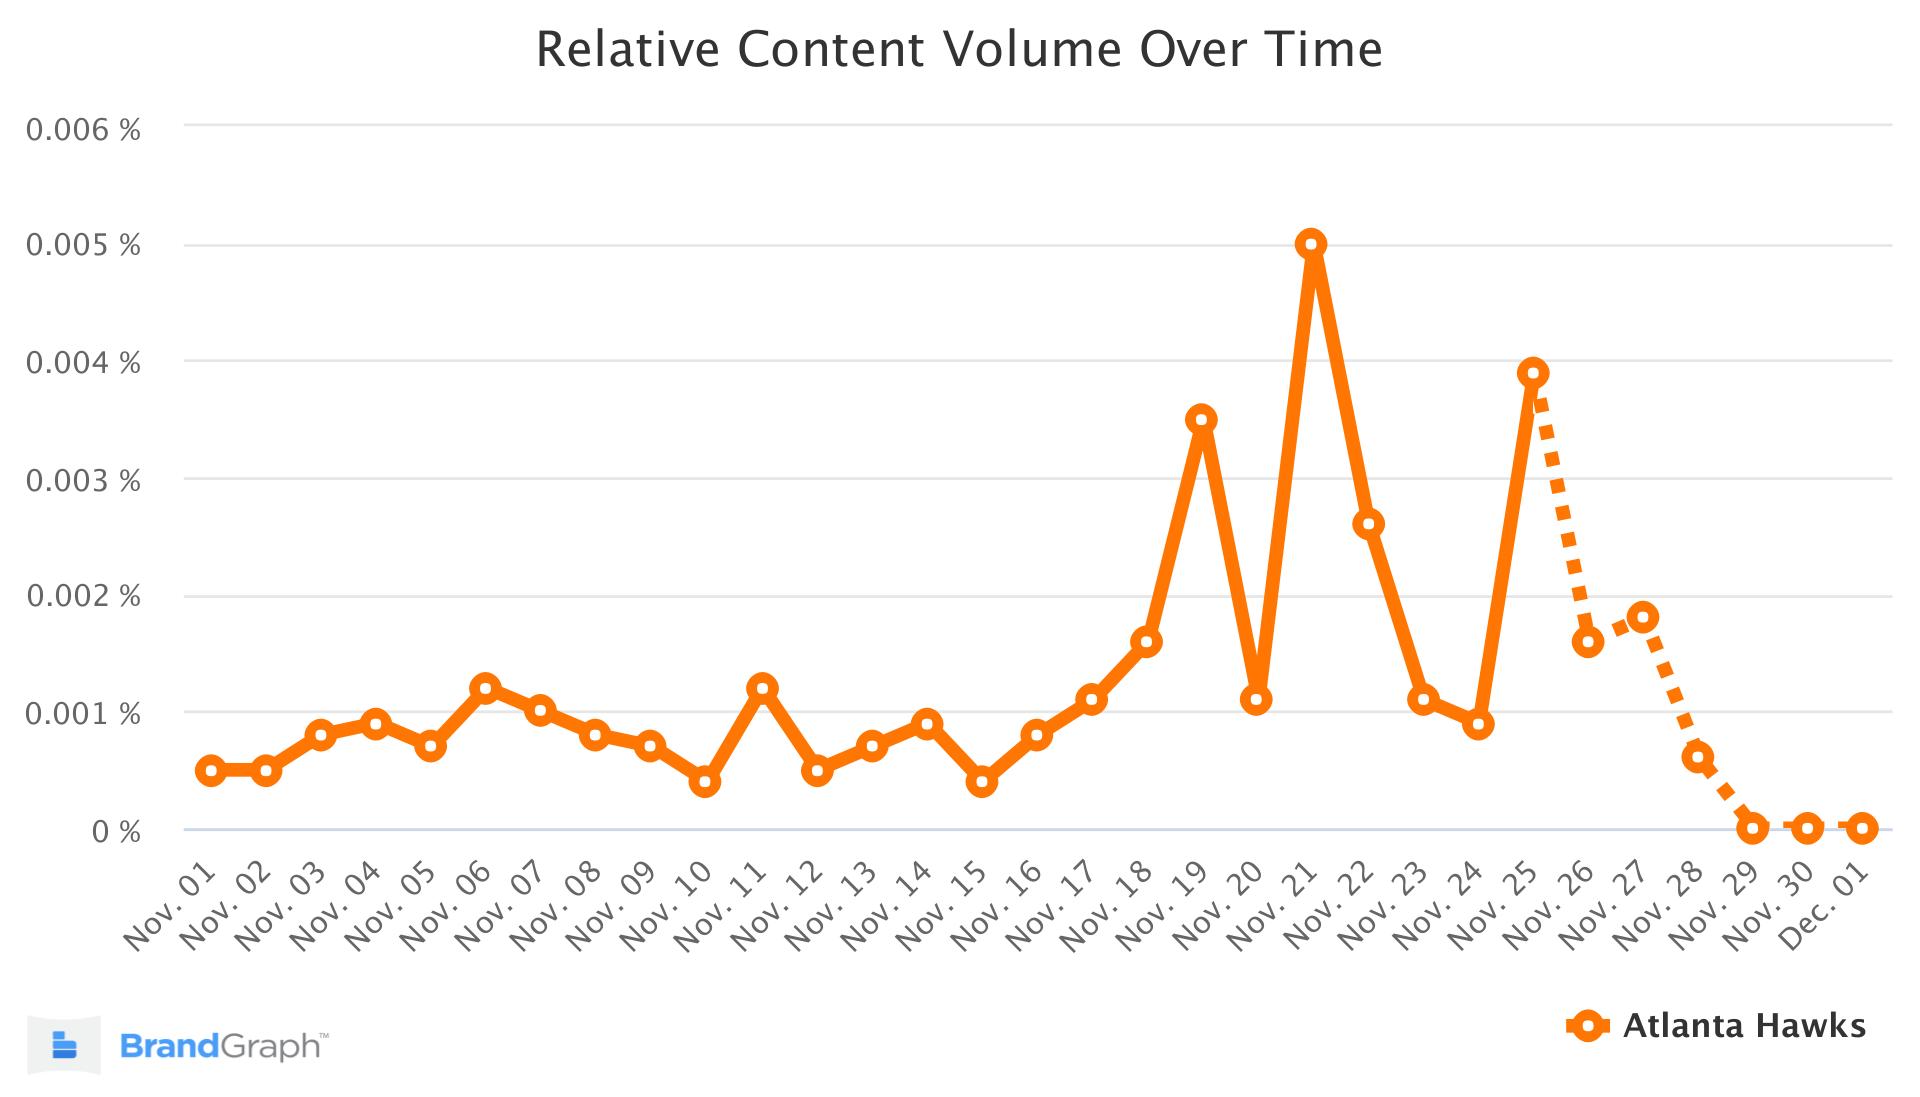 Atlanta Hawks BrandGraph Trend